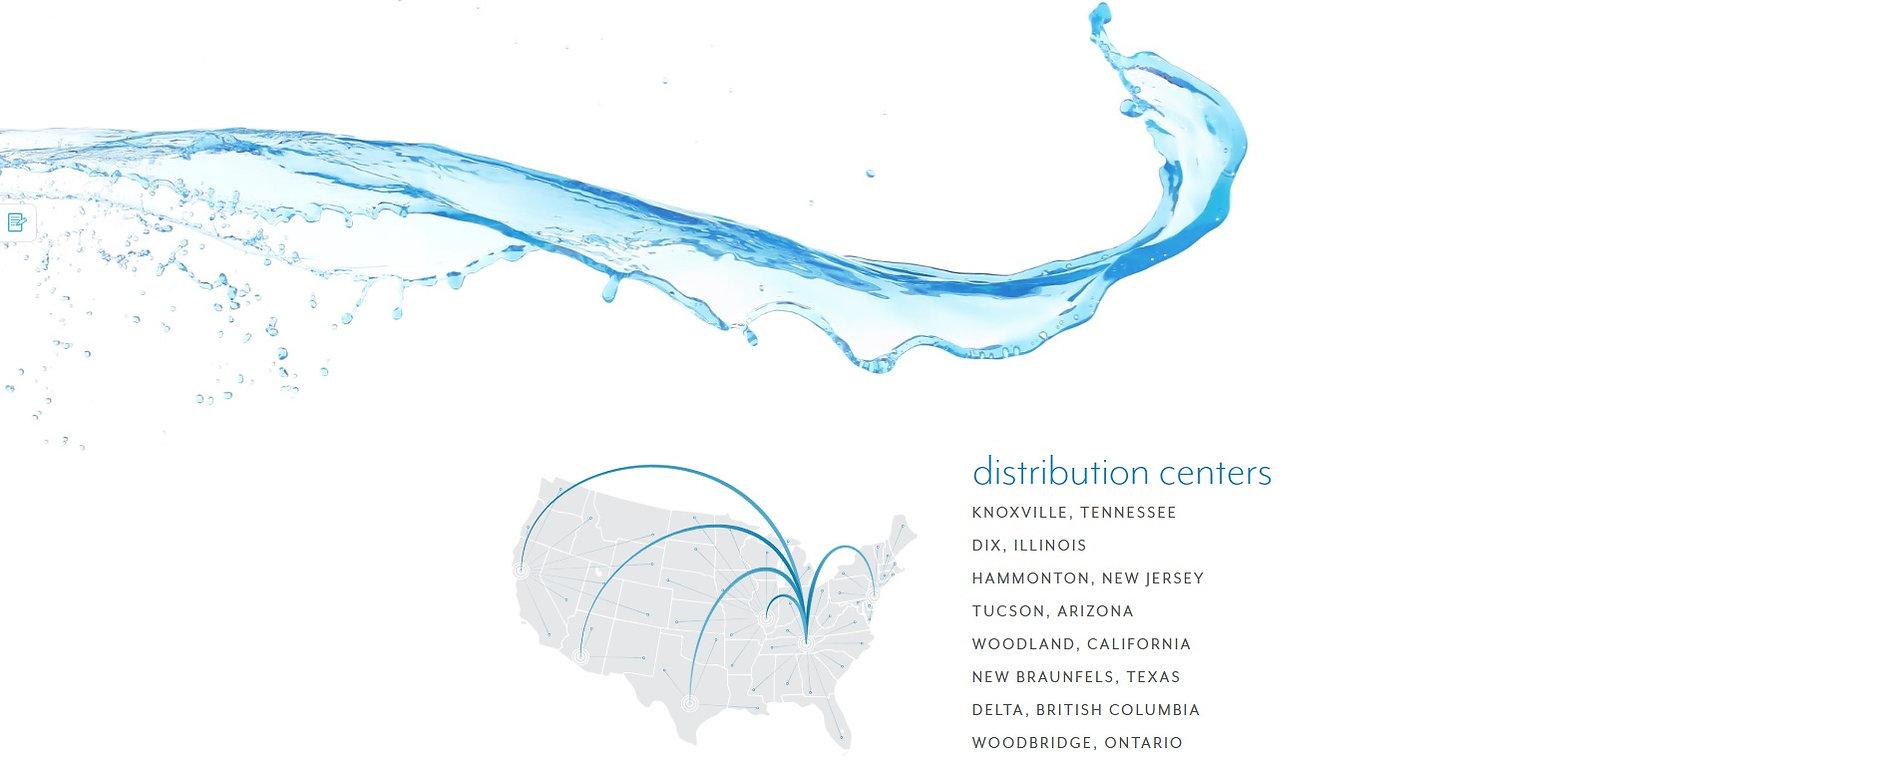 Dist Locations.jpg